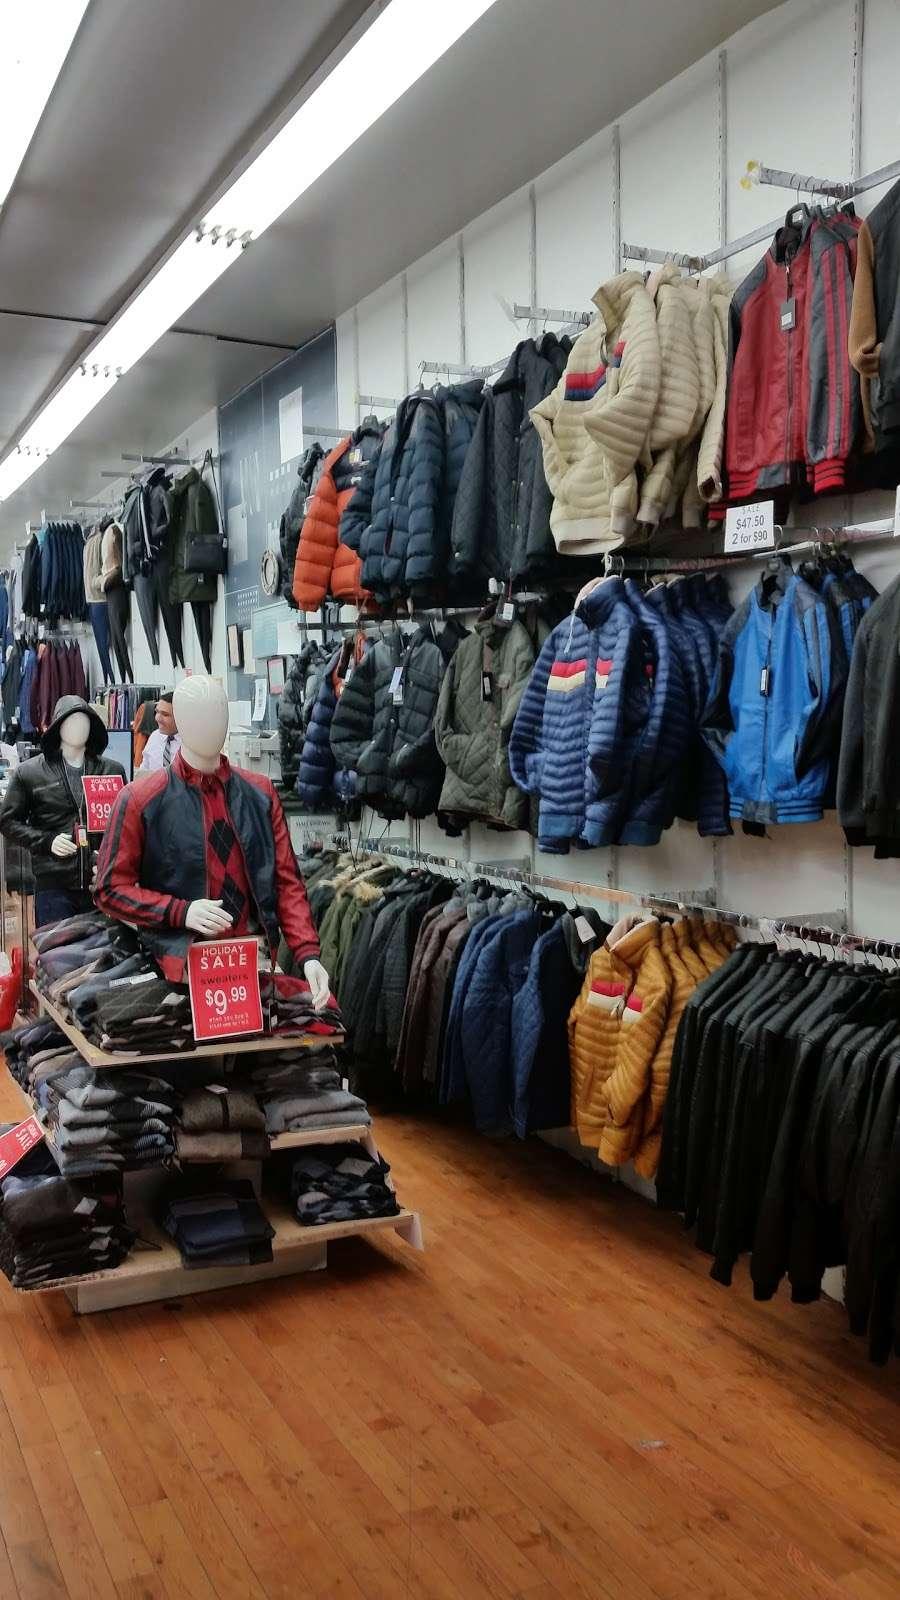 Portabella - shoe store  | Photo 5 of 10 | Address: 320 Livingston St, Brooklyn, NY 11217, USA | Phone: (718) 852-8997